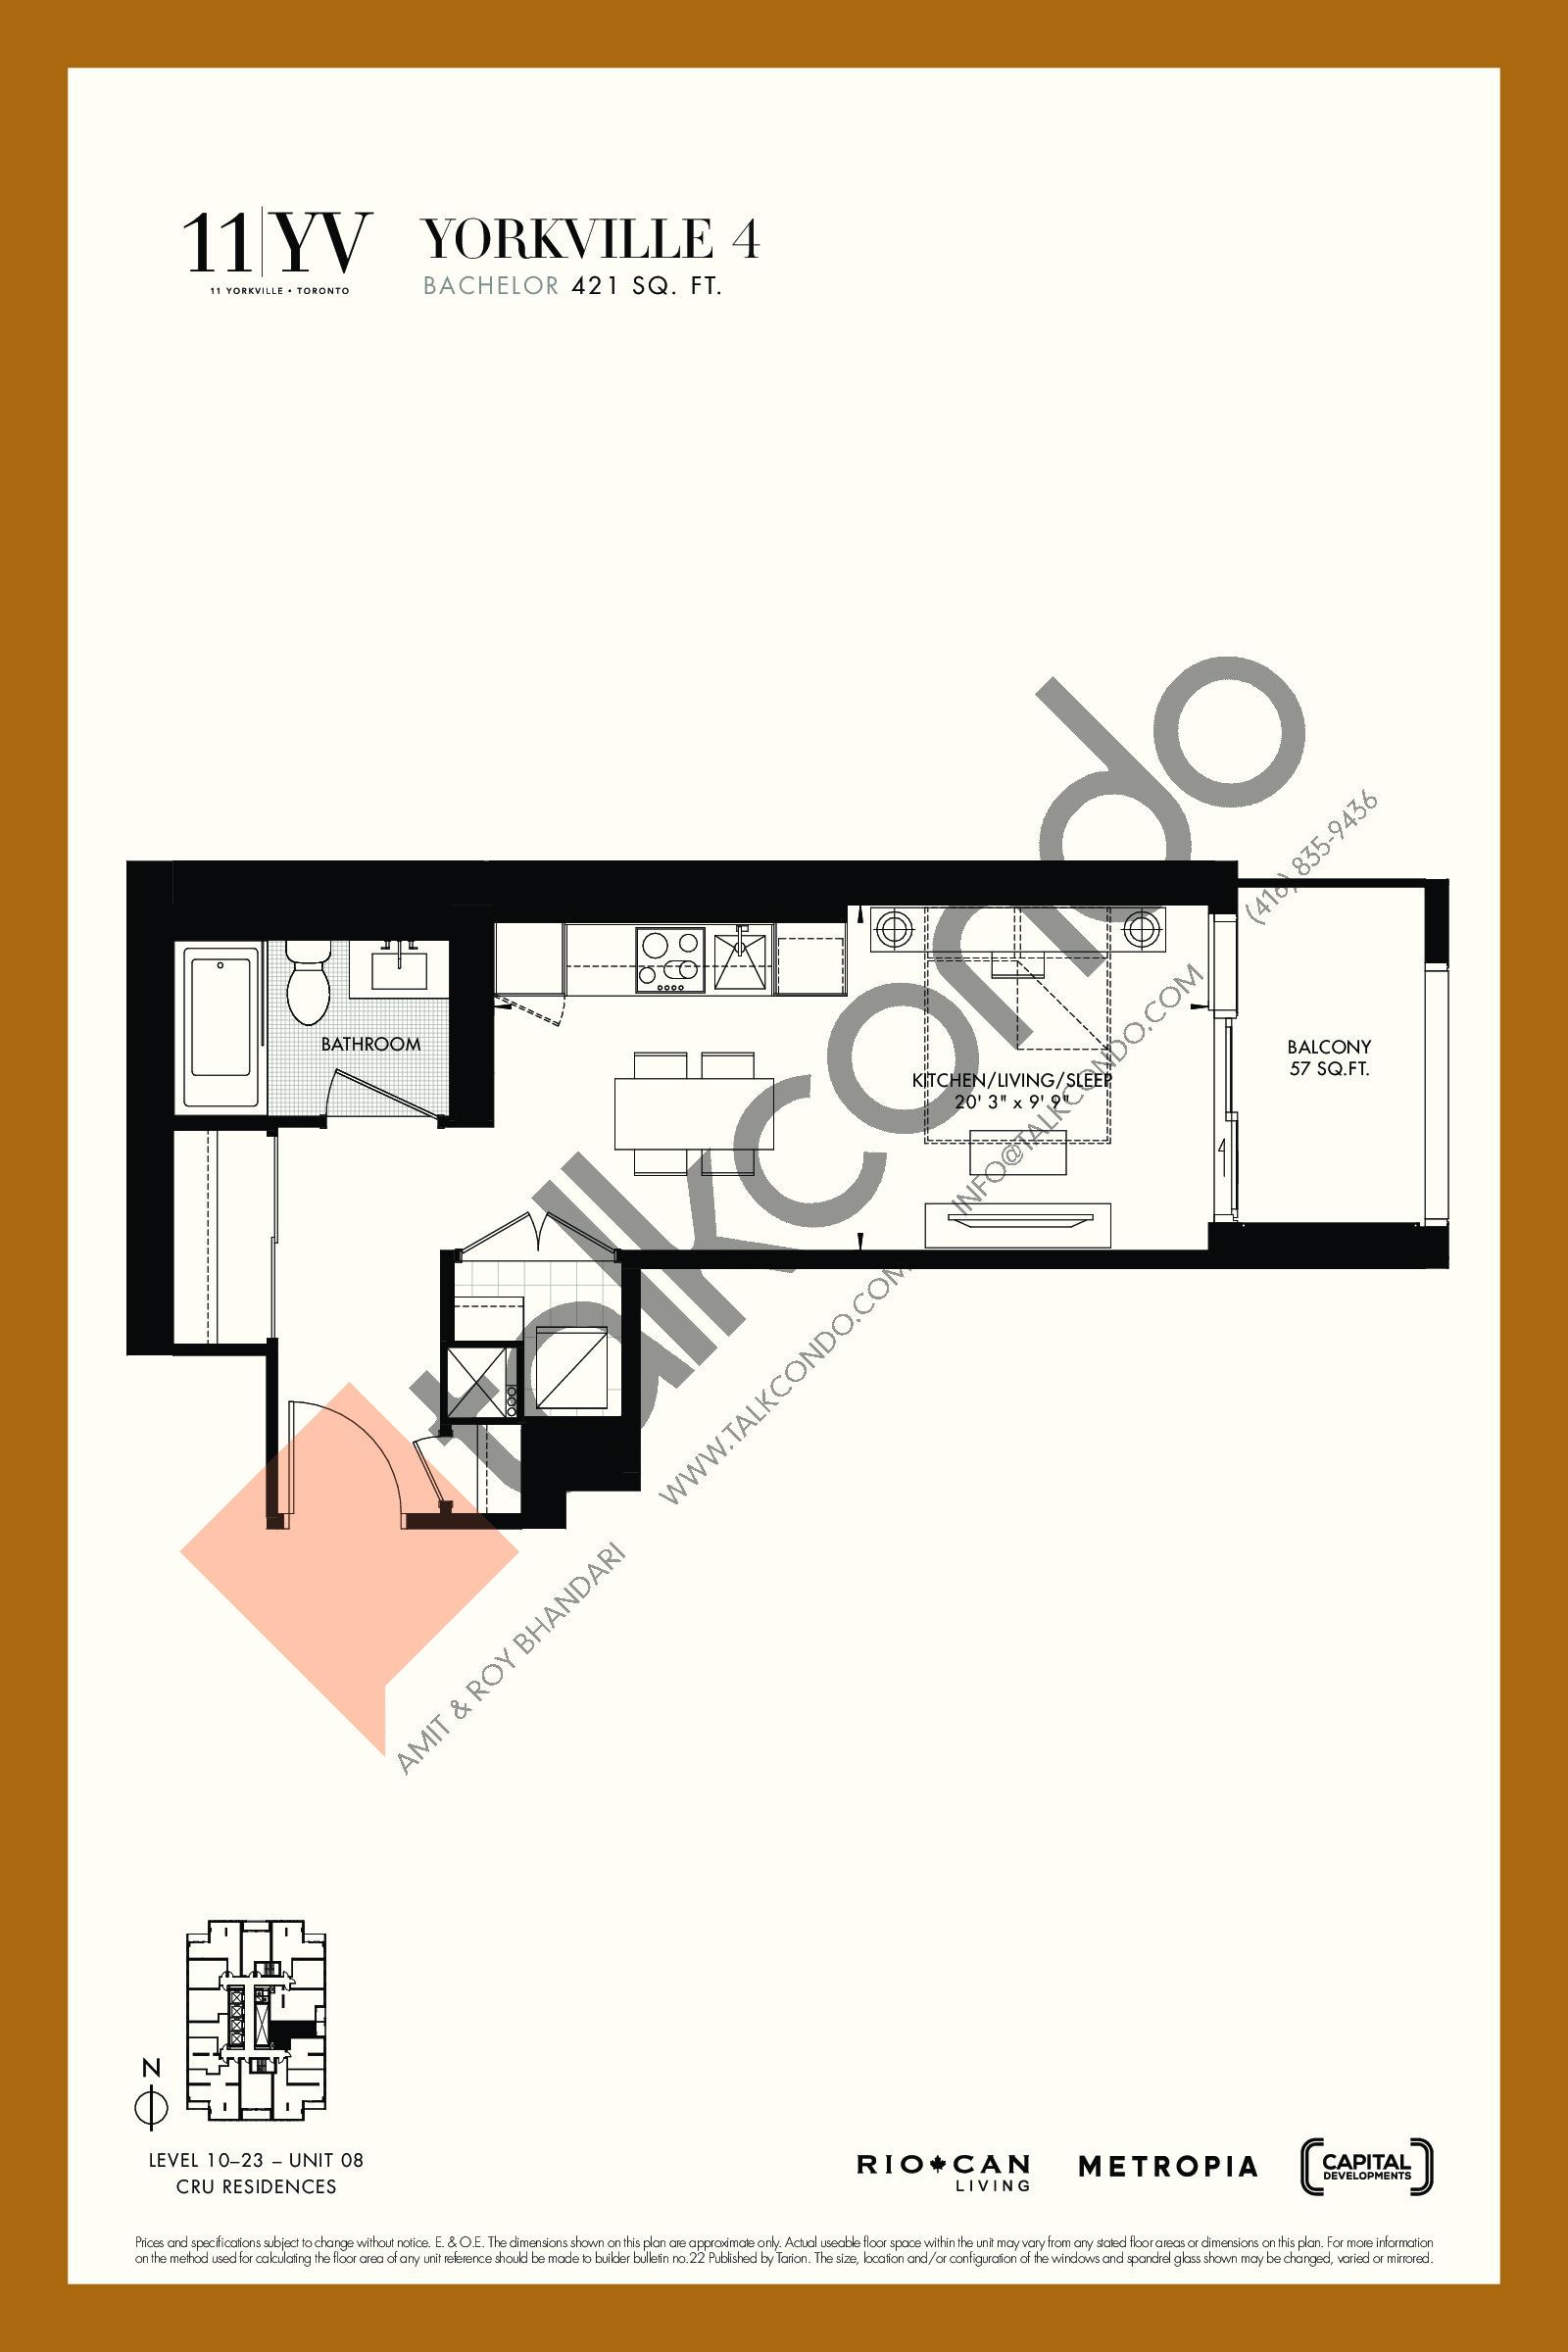 Yorkville 4 Floor Plan at 11YV Condos - 421 sq.ft